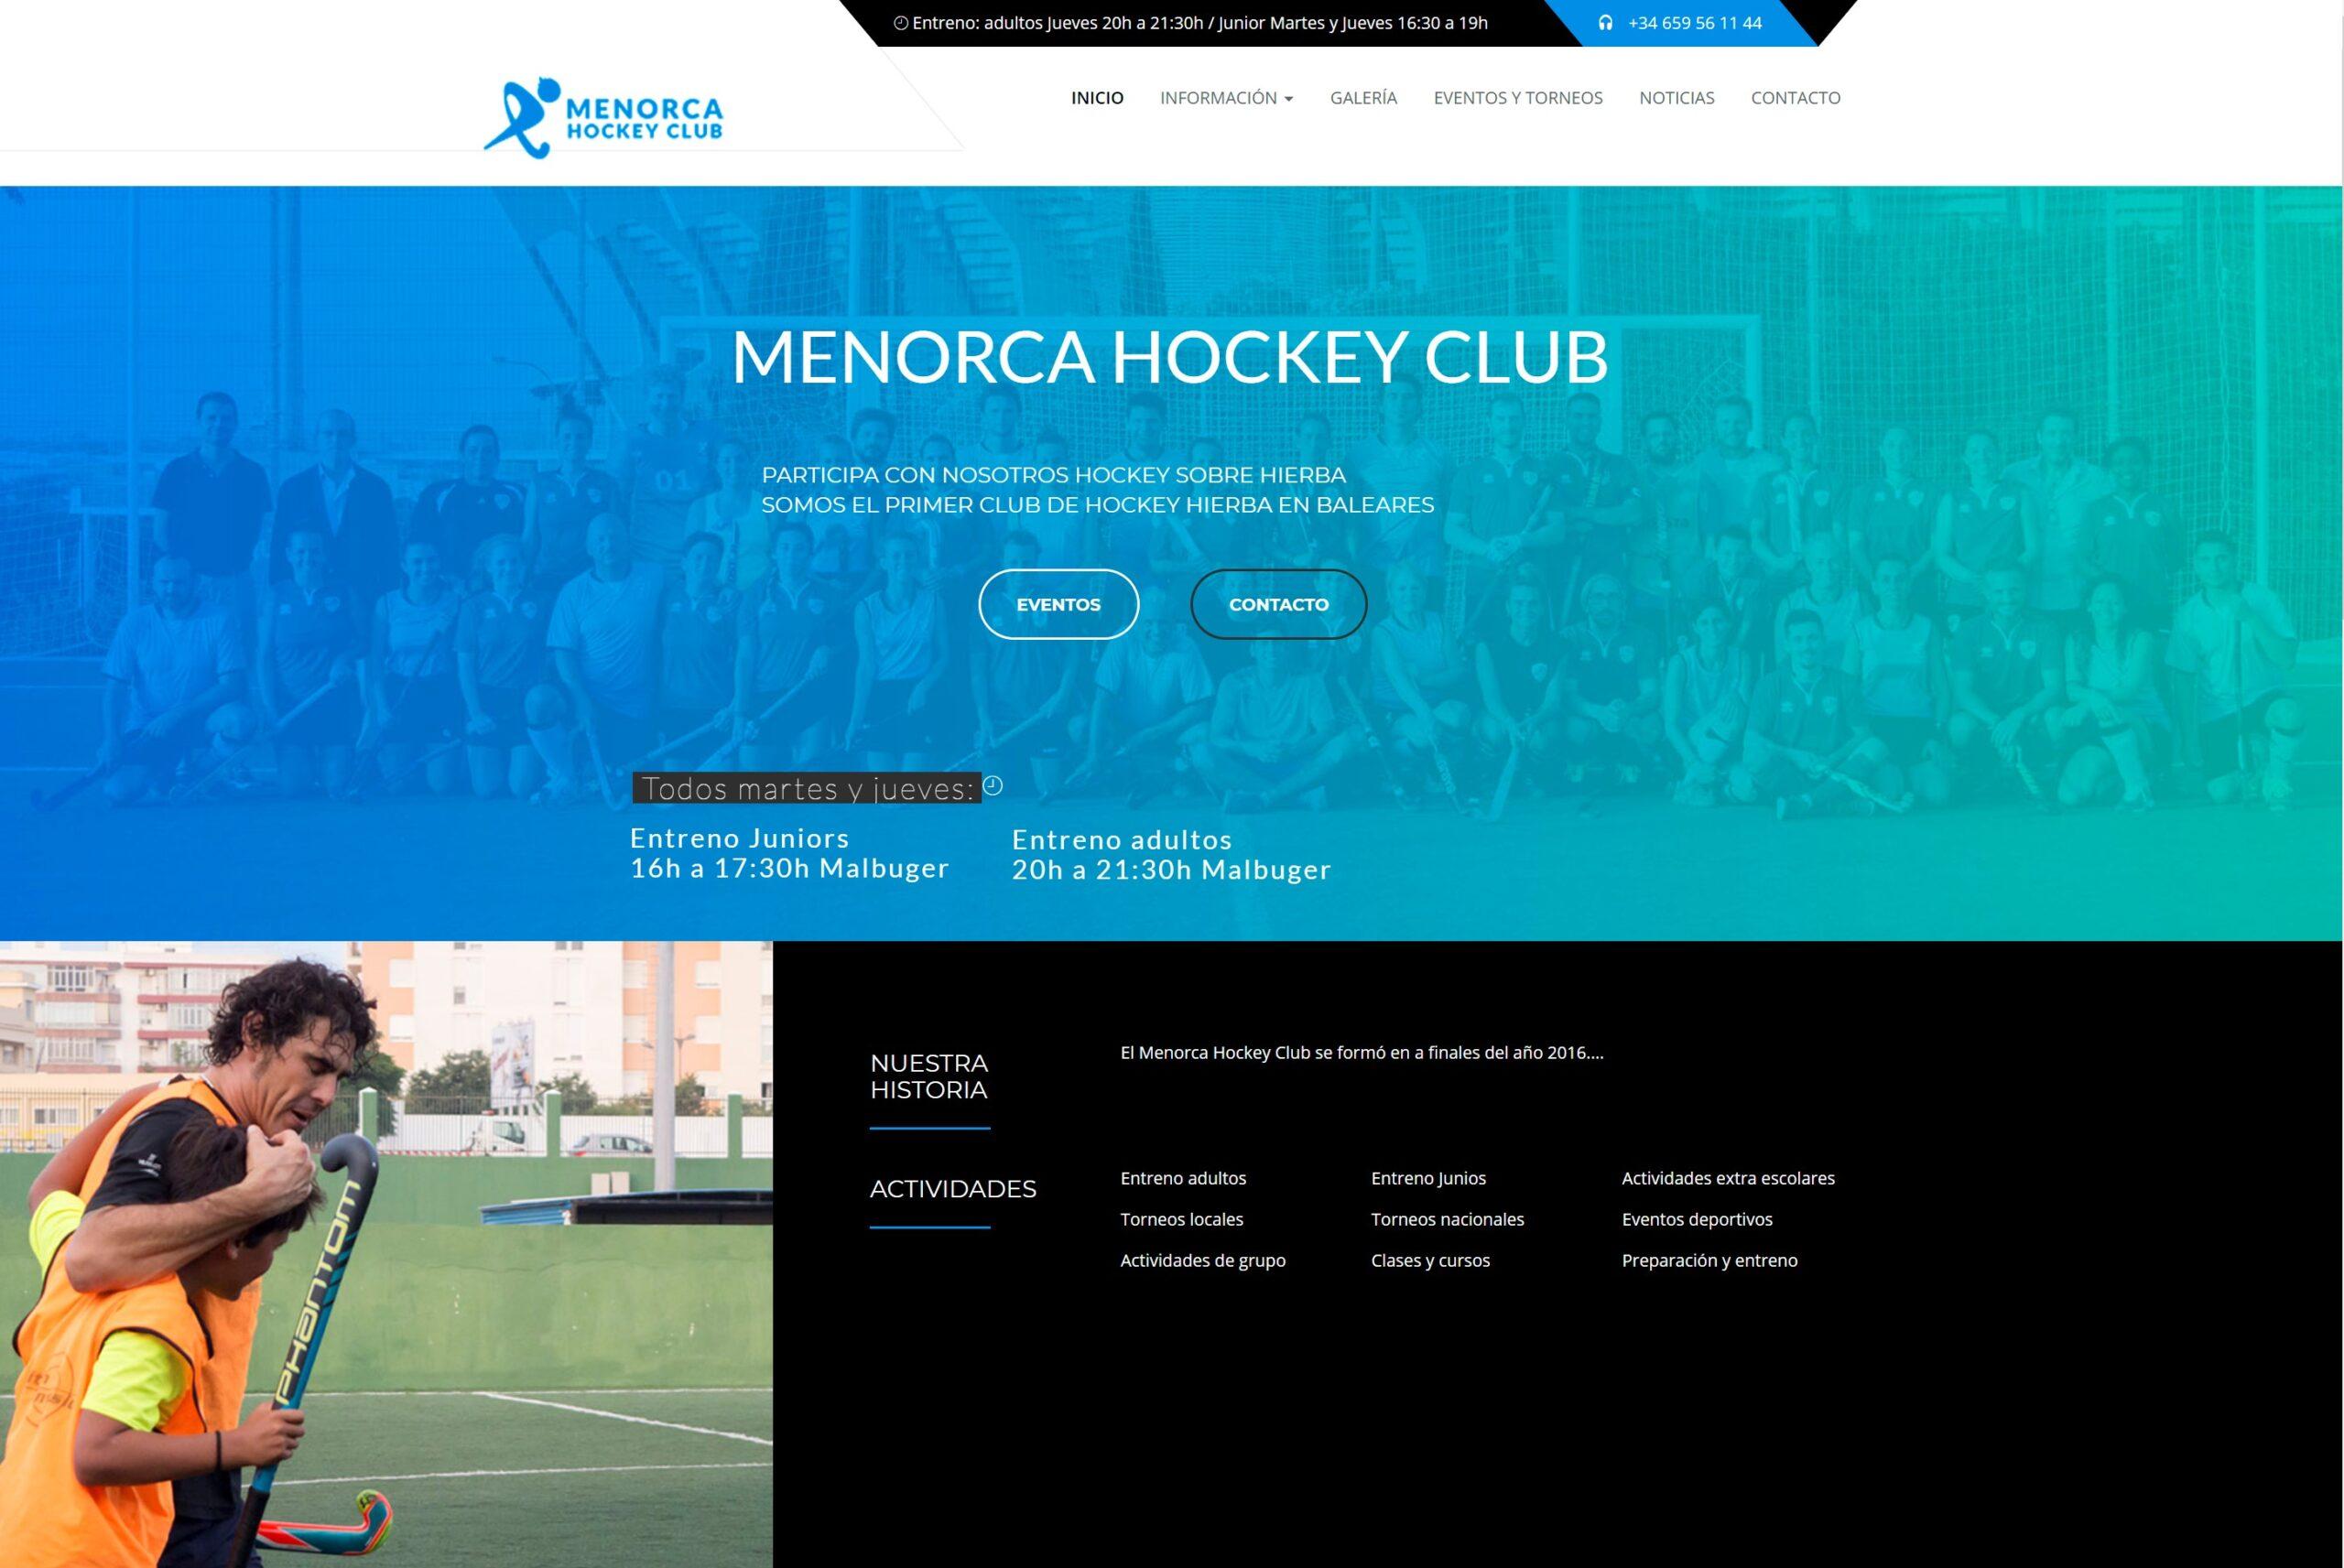 Menorca Hockey Club